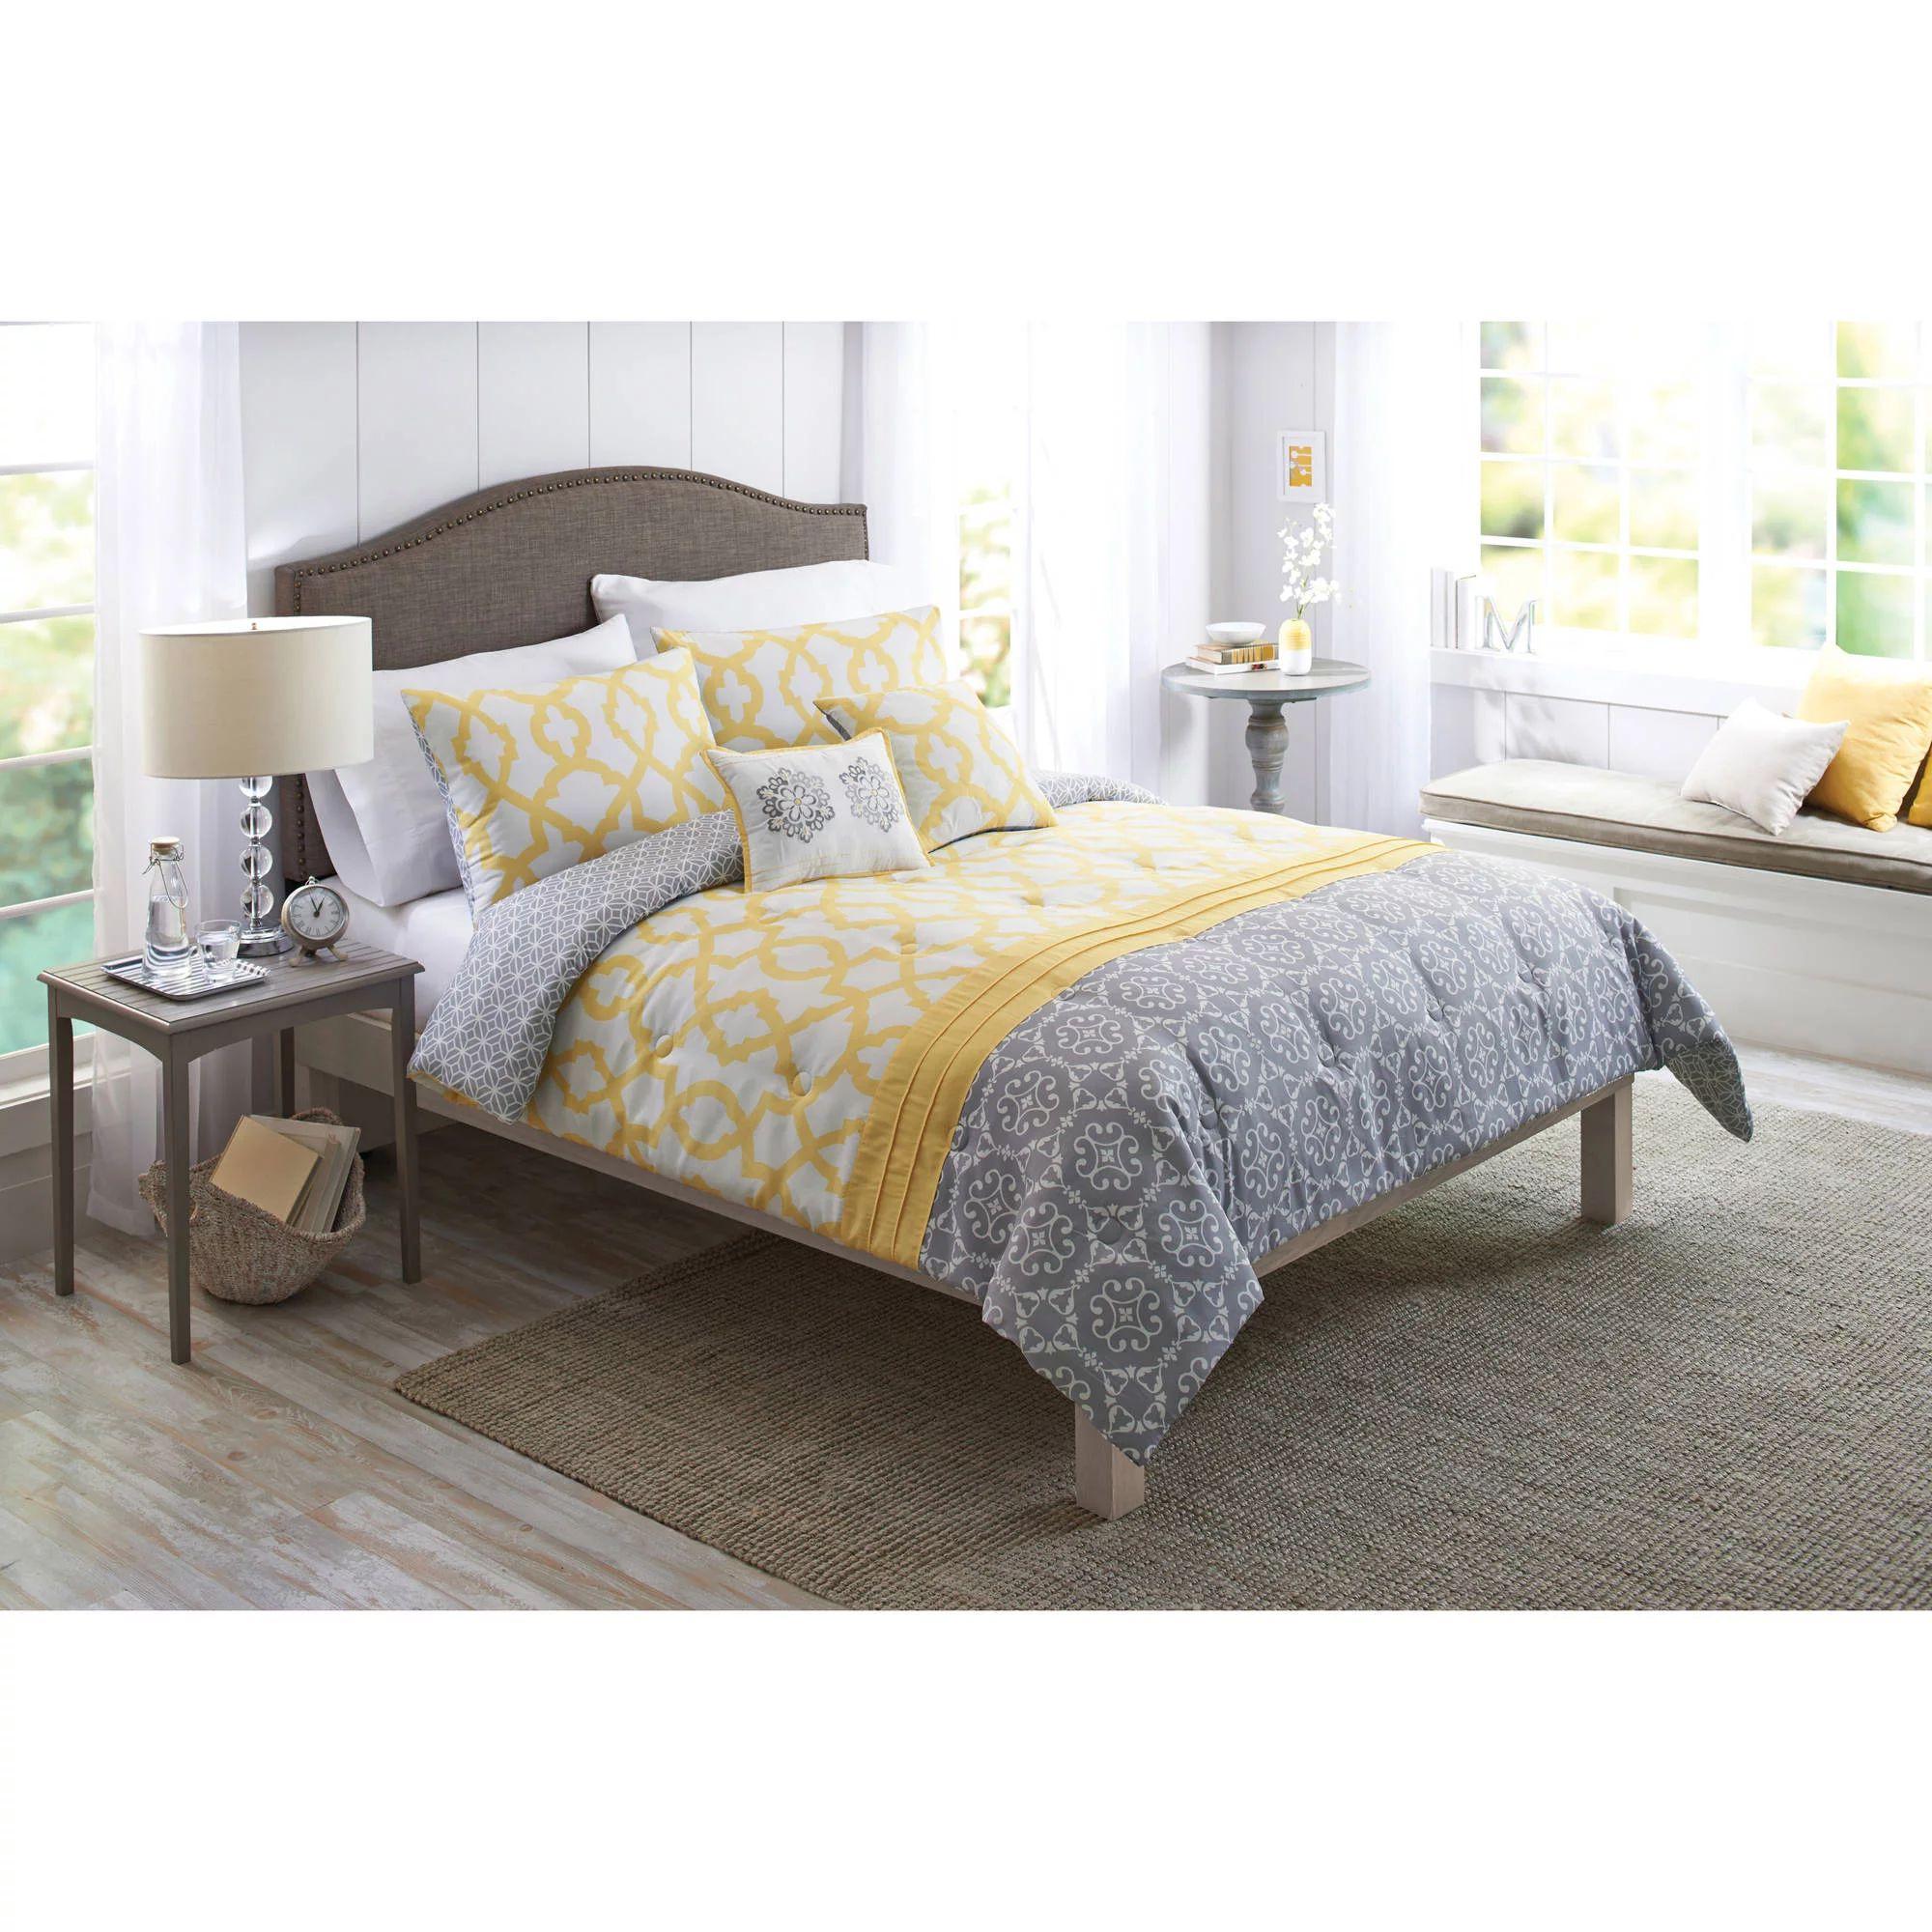 Better homes and gardens yellow and gray medallion 5 piece bedding comforter set walmart com